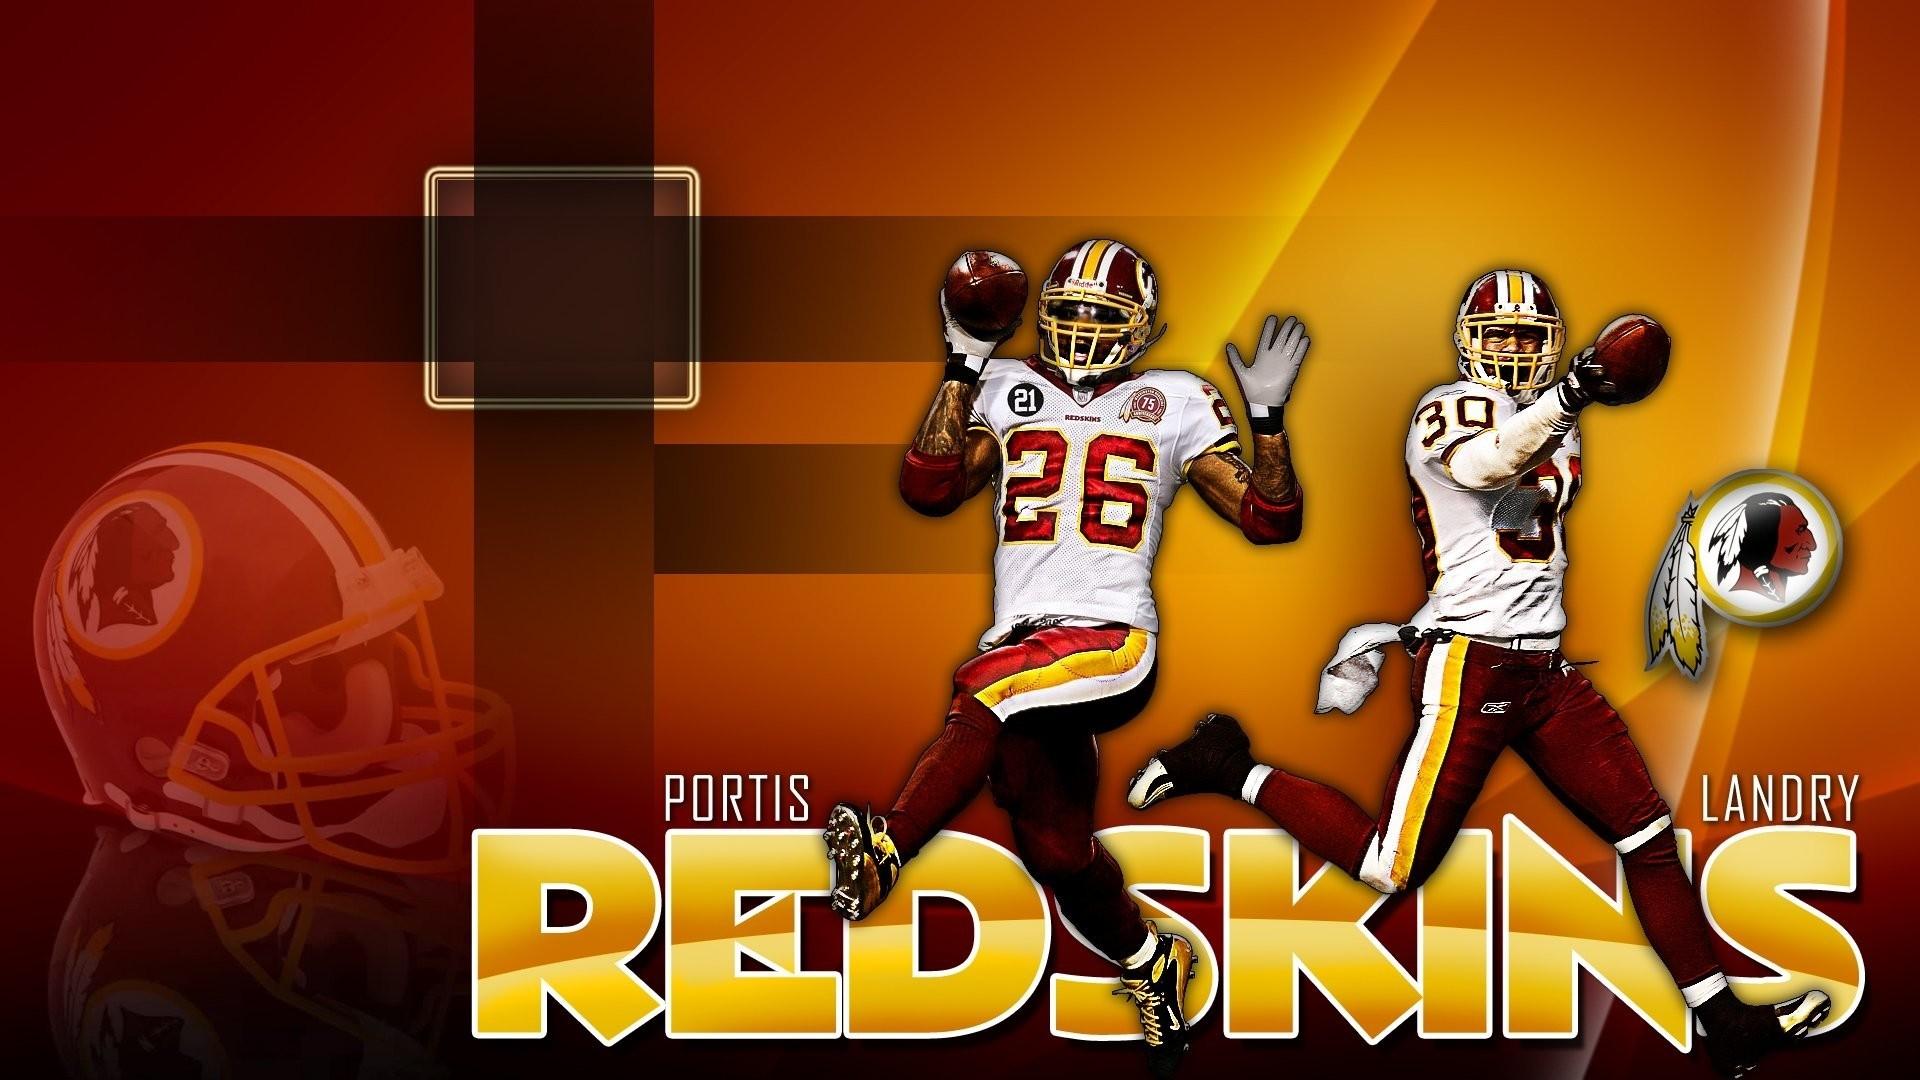 Redskins Full HD Wallpaper